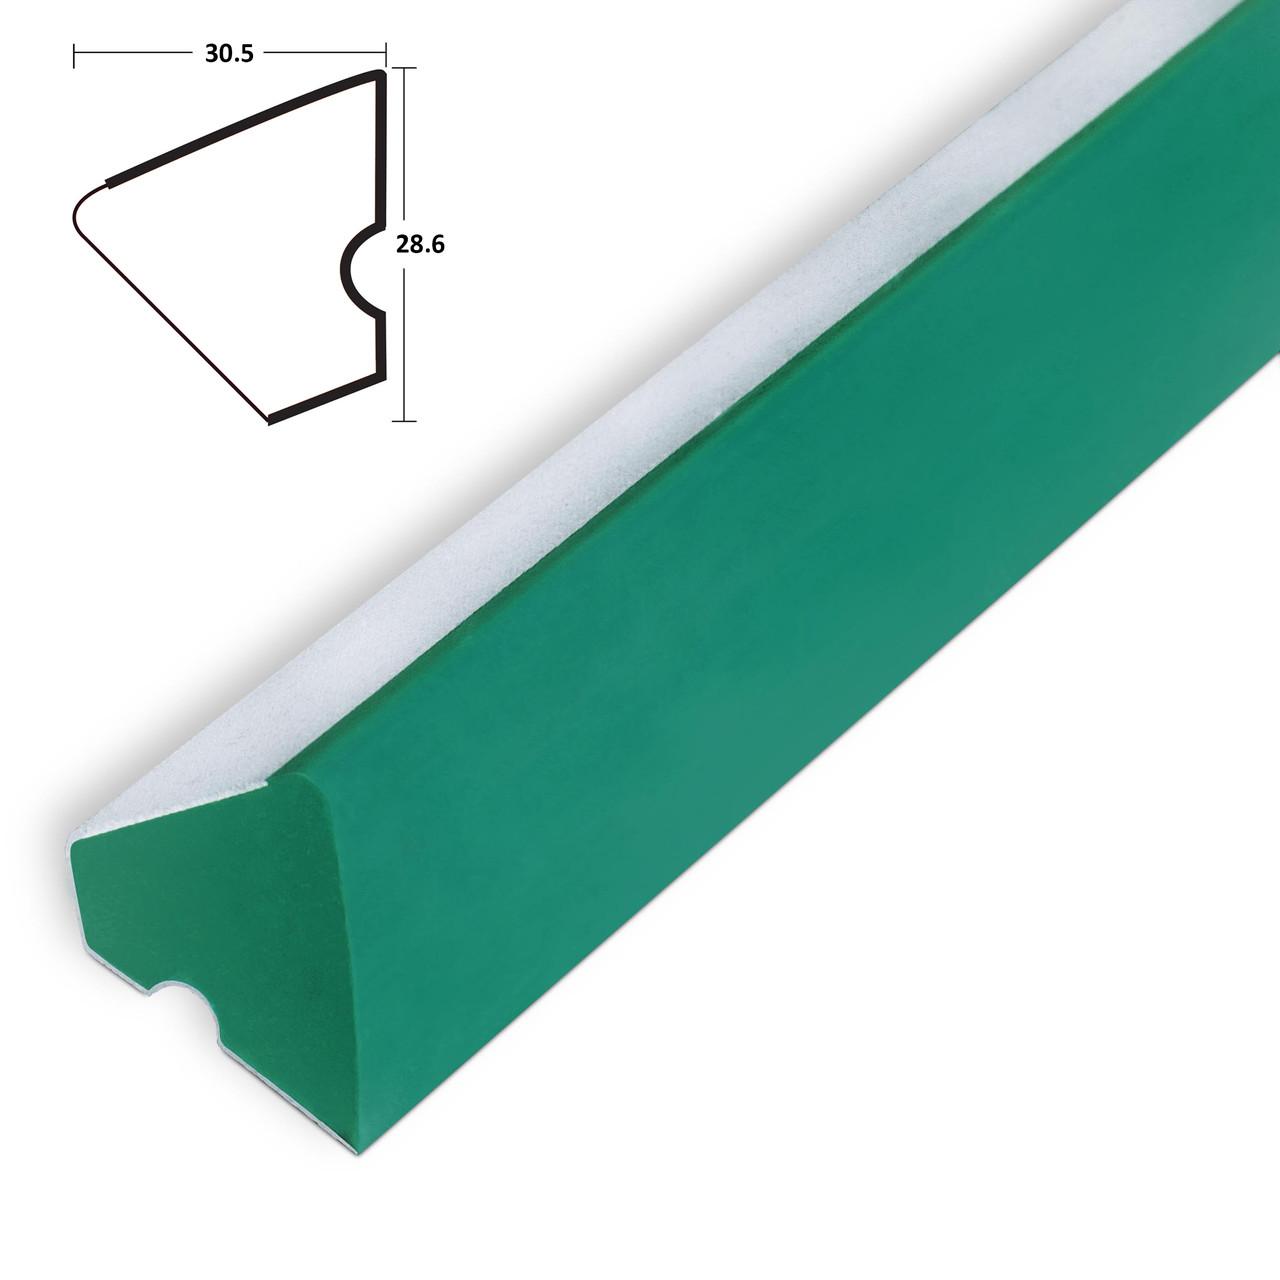 Резина для бортов Пирамида U118 140см 10Фт 6шт